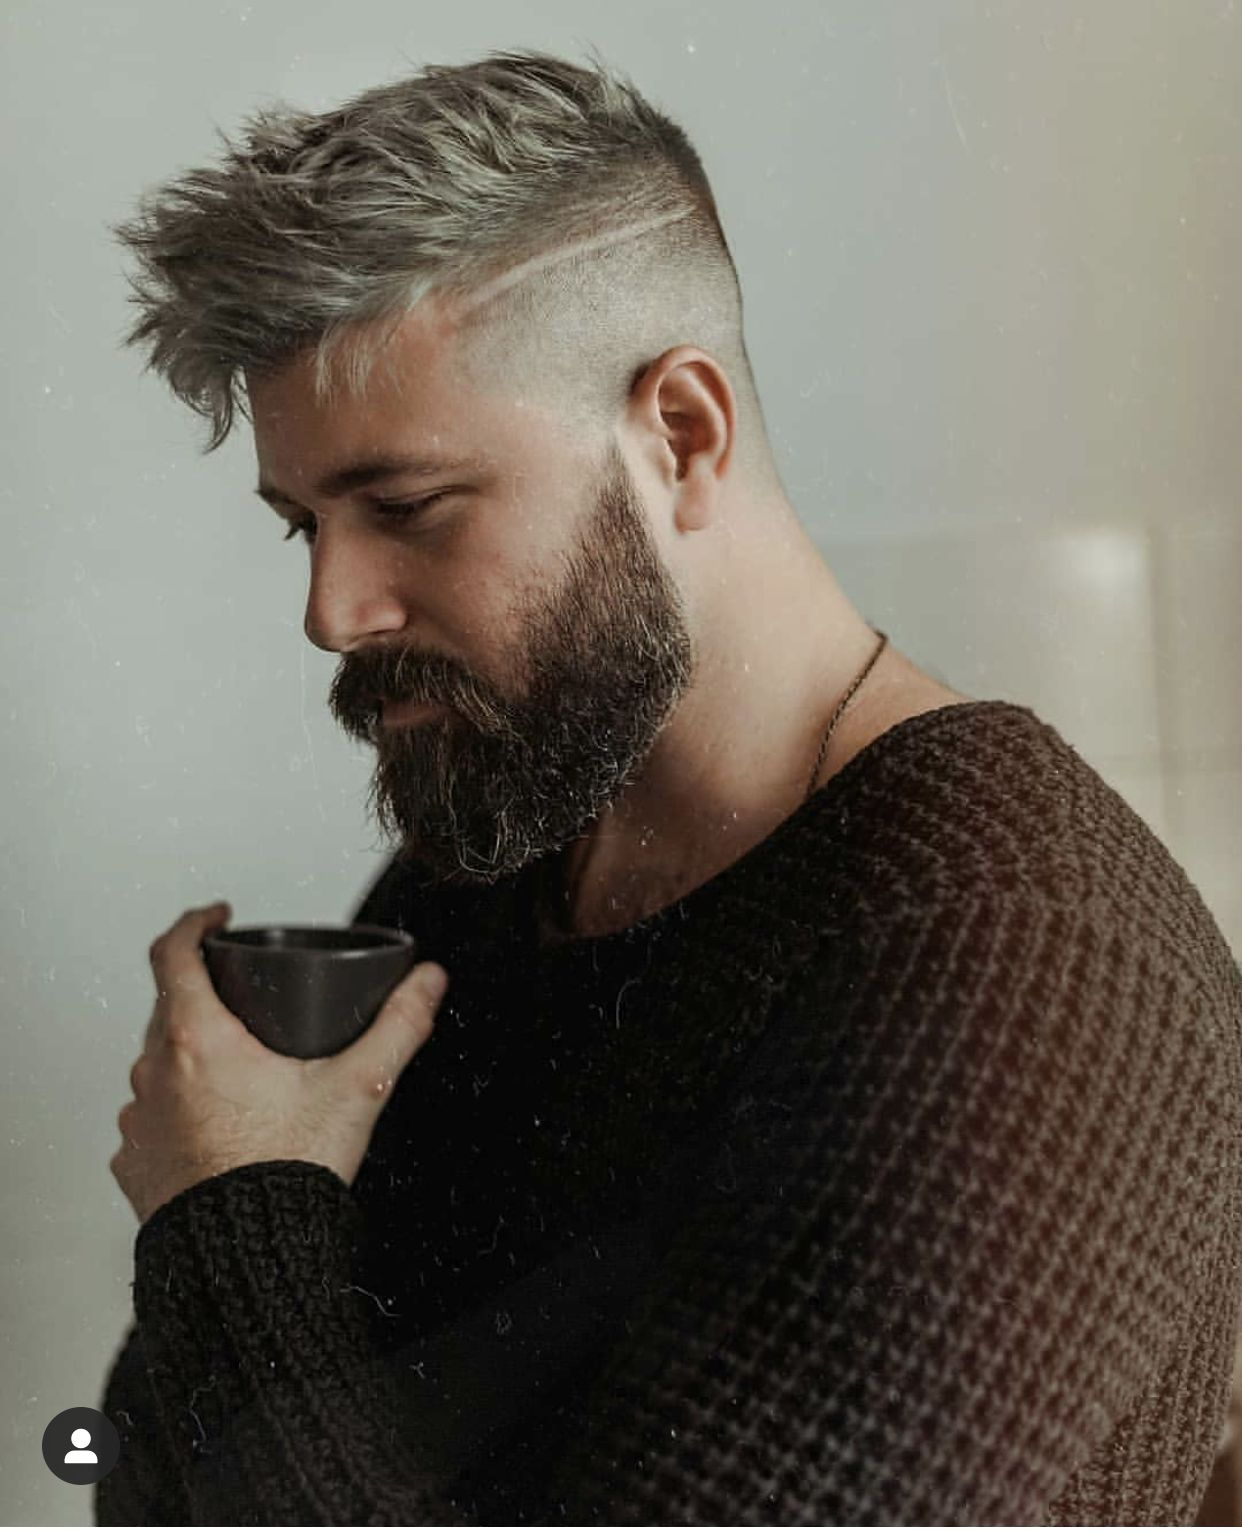 Pin de Ute Remmel en Männer   Estilos de barba, Tipos de ...